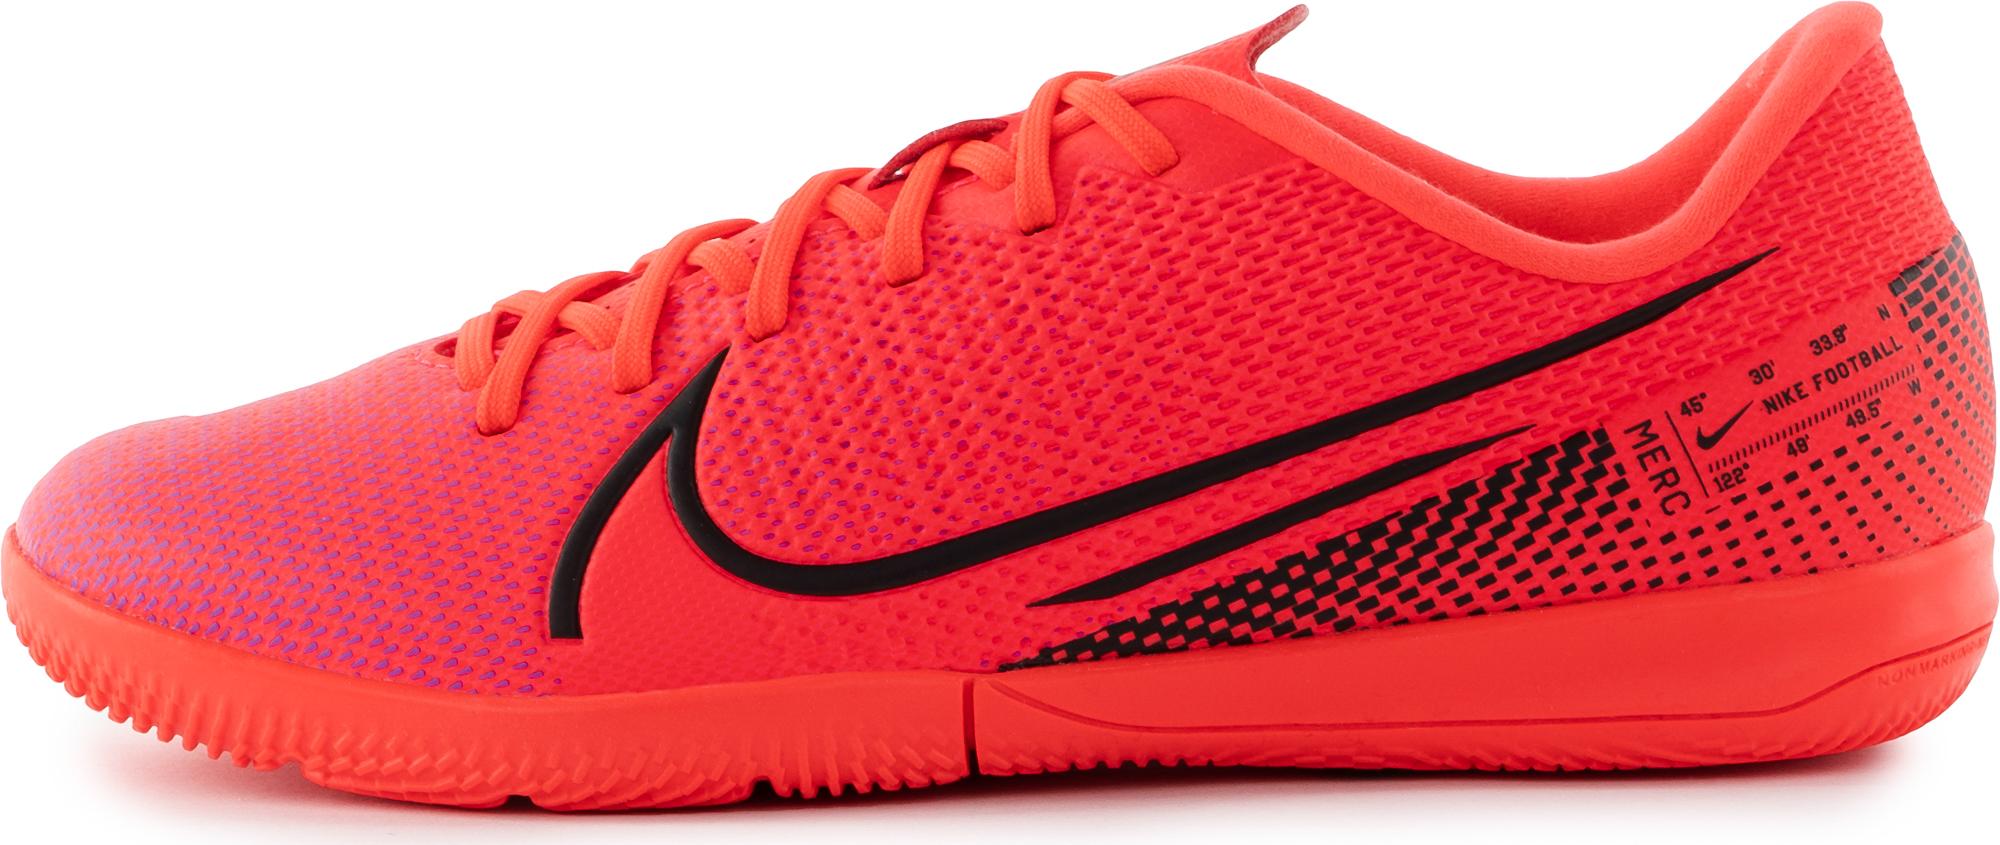 цена Nike Бутсы для мальчиков Nike Jr. Mercurial Vapor 13 Academy IC, размер 35 онлайн в 2017 году